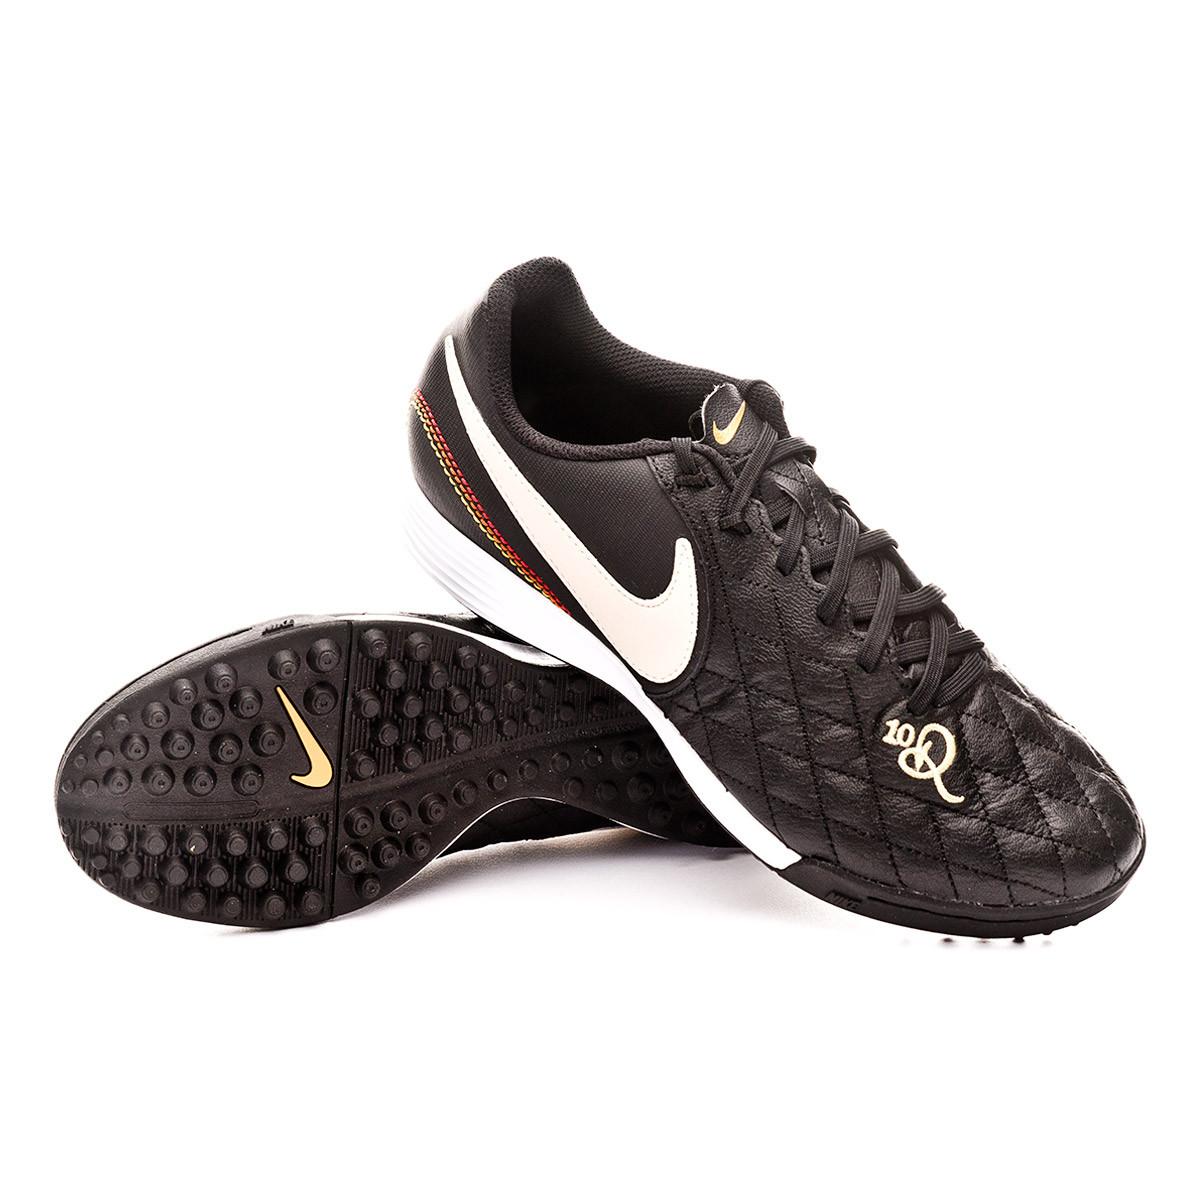 232bf2c72 Football Boot Nike Tiempo LegendX VII Academy 10R Turf Black-Light  orewood-Metallic gold - Football store Fútbol Emotion